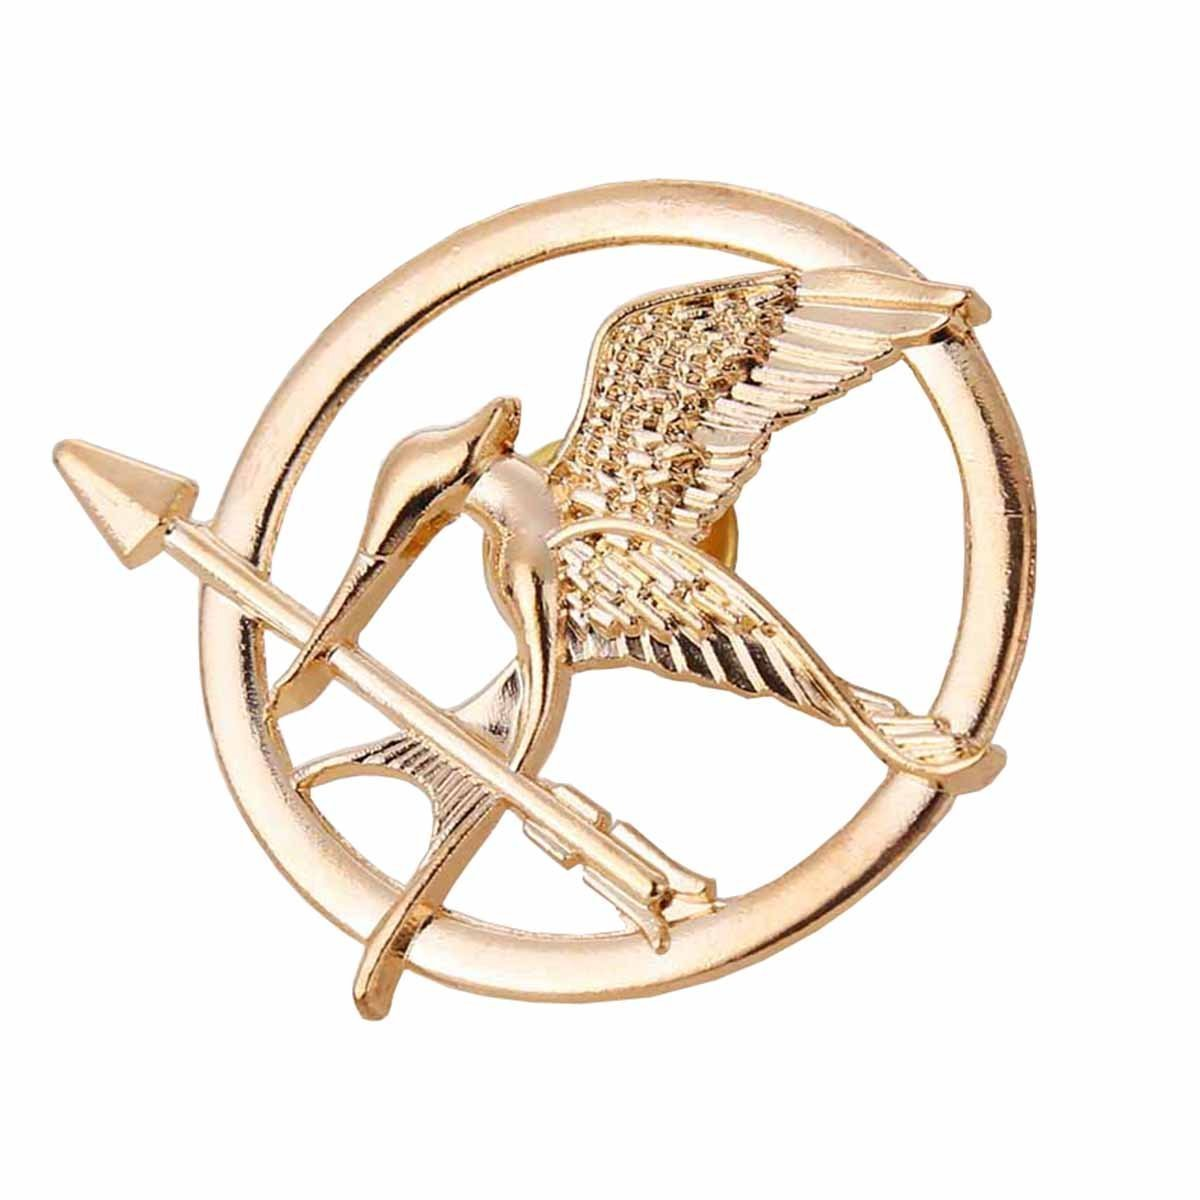 Sungpunet The Hunger Games Film Sinsajo Prop Rep Pin ...